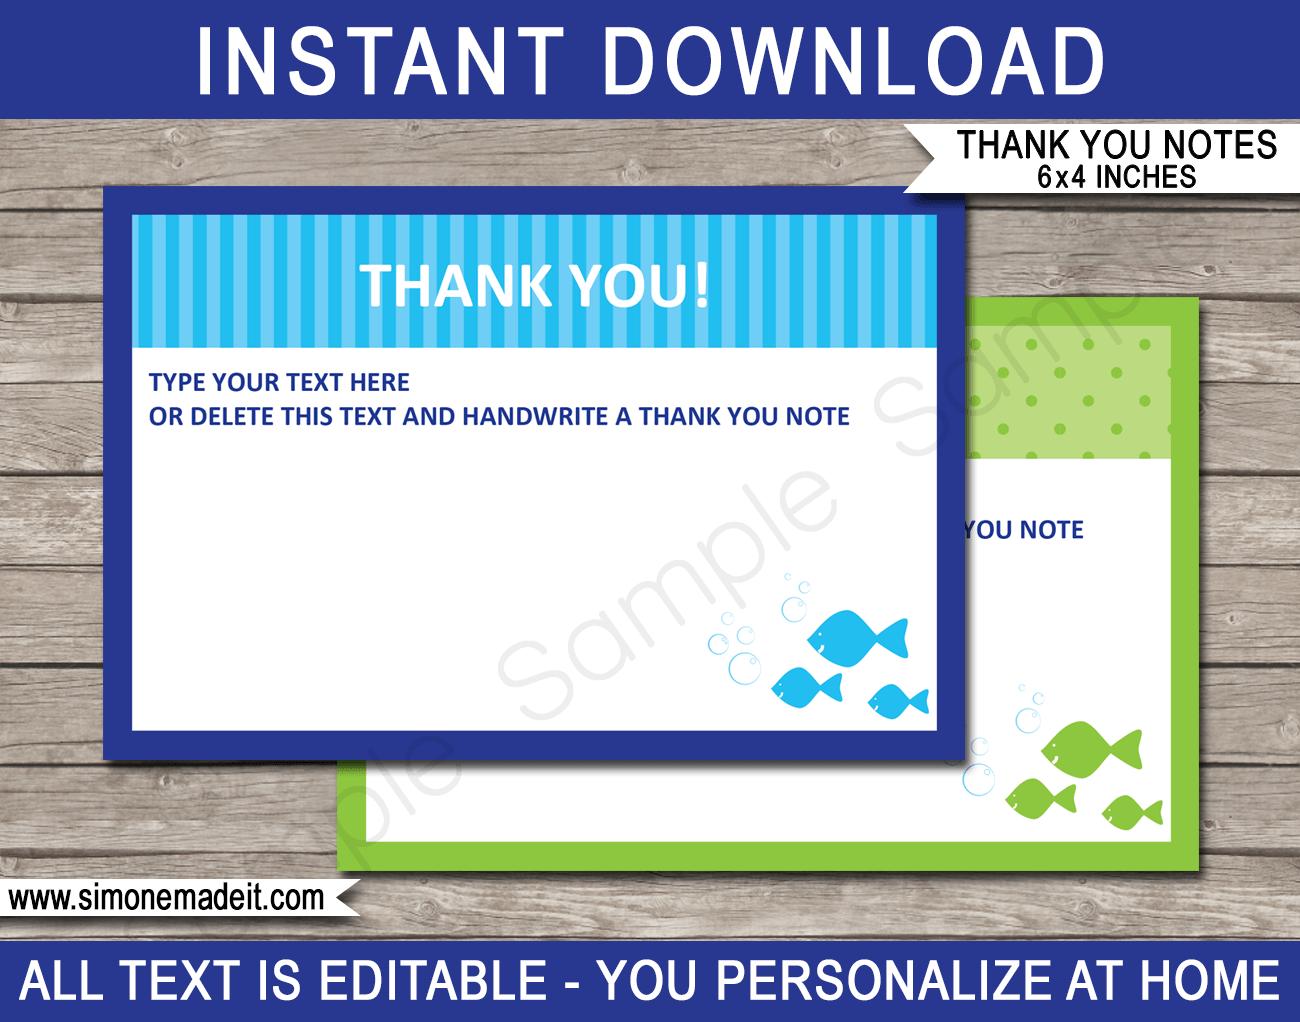 Printable Under The Sea Party Thank You Note Cards - DIY Editable Template - via SIMONEmadeit.com